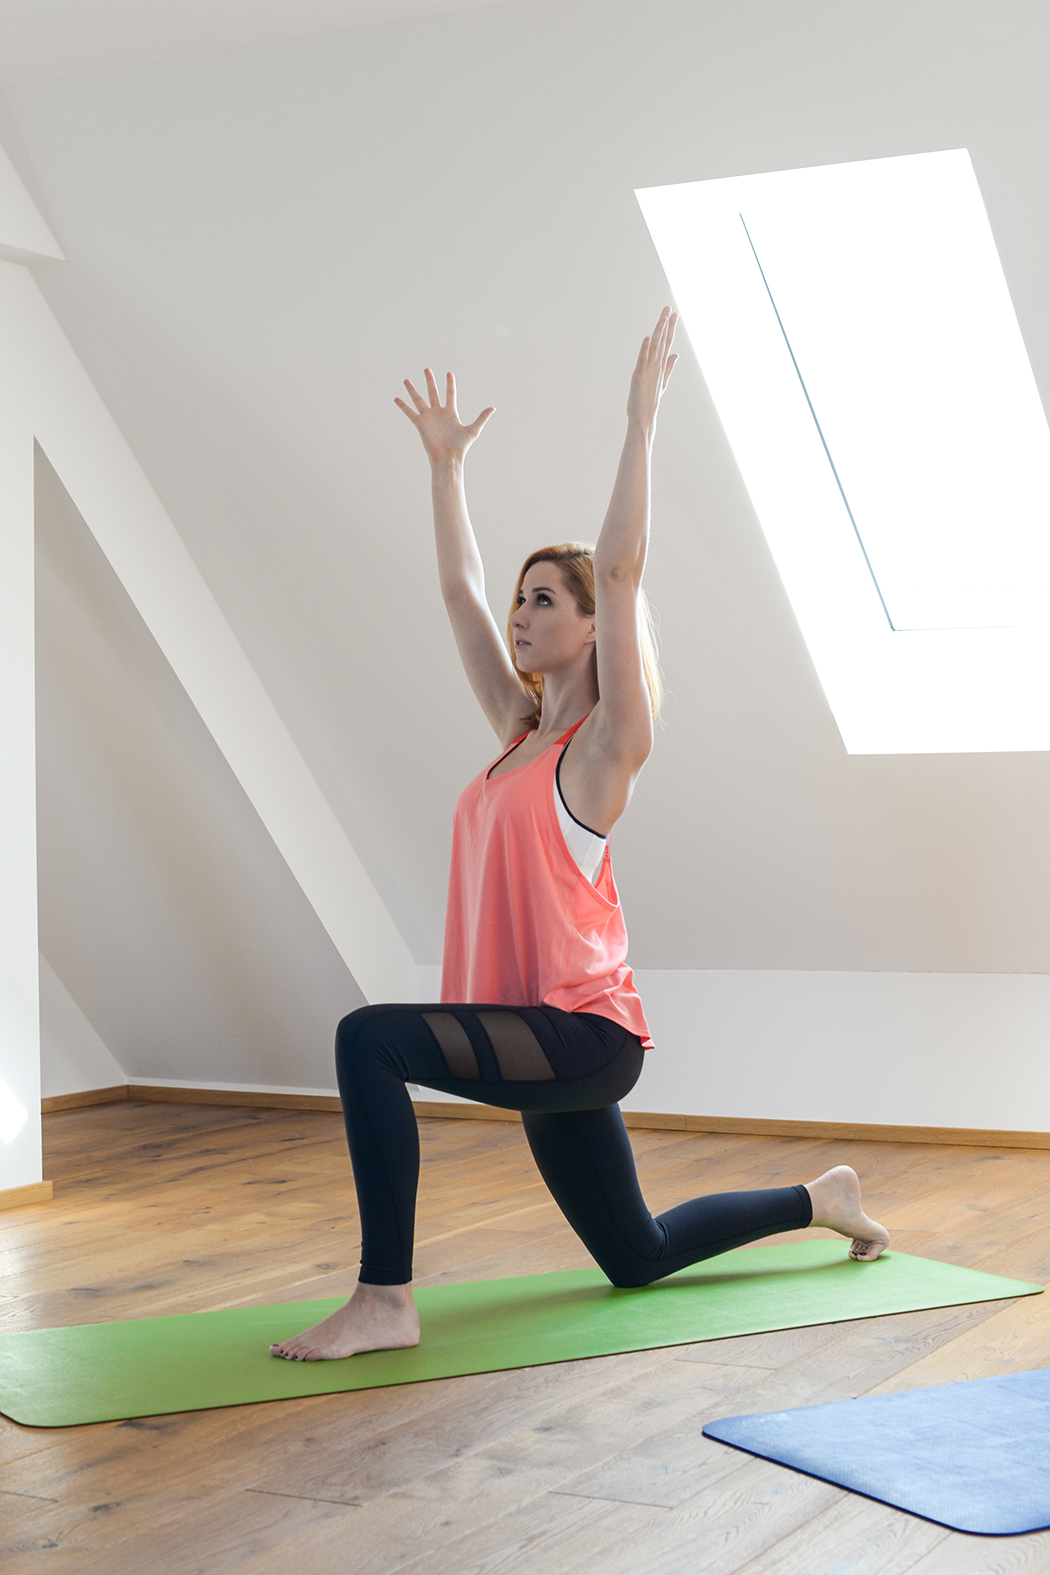 Fitnessblog-Fitnessblogger-Fitness-Blog-Yoga-Lifestyle-für-Anfänger-Anfängerjoga-Lindarella-Posen_Yoga-Calyana-Buket-Akkus-Airex-2-web